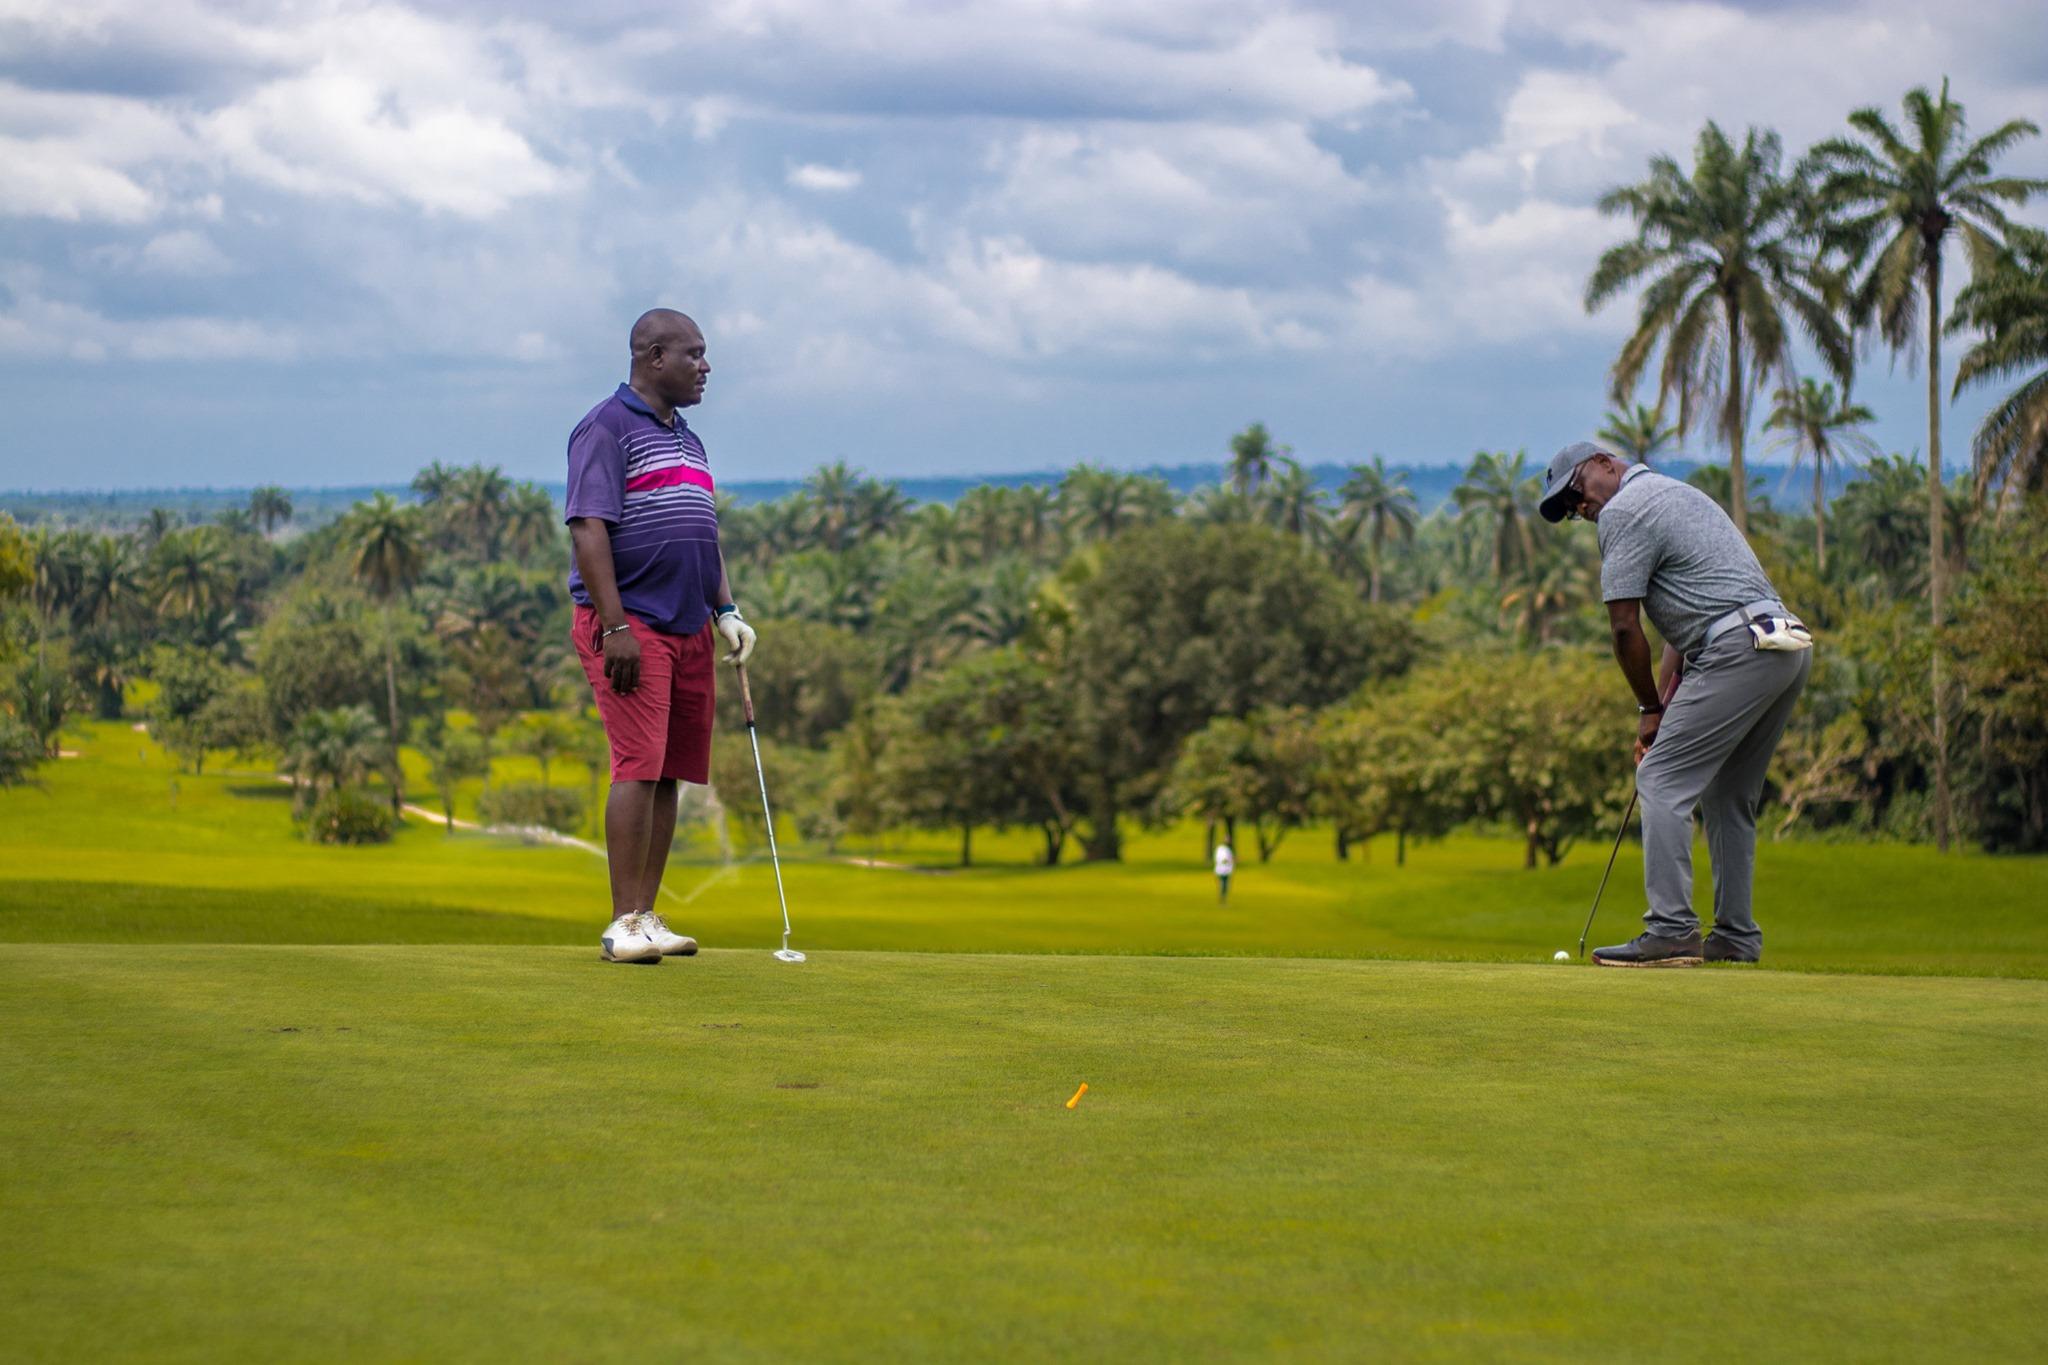 IBOM ICON Hotel & Golf Resort Introduces New Performance Reward Programs Brandspurng2